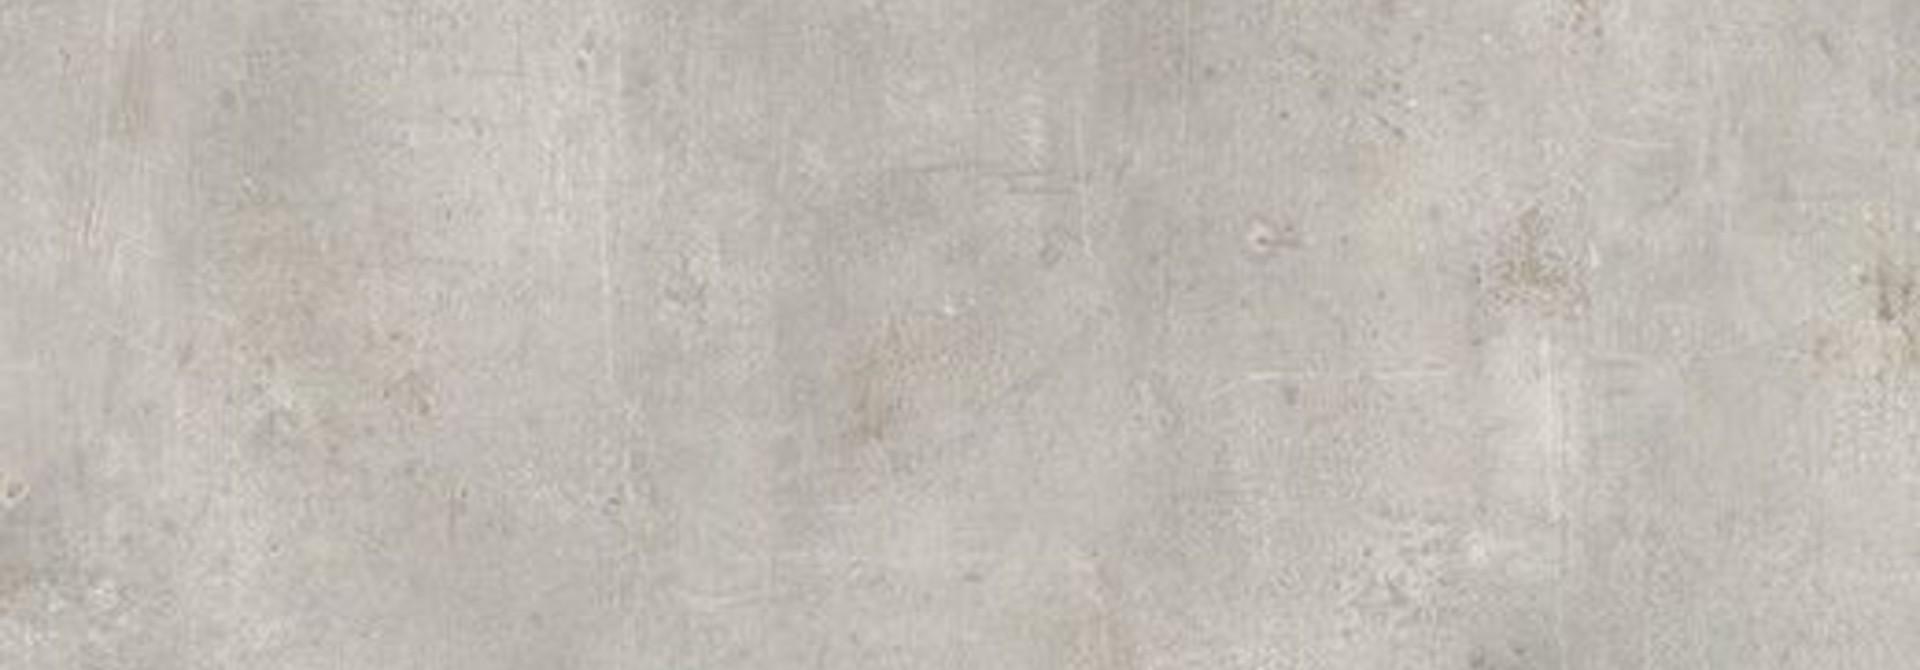 Interfloor Dynamic Concrete 400 breed